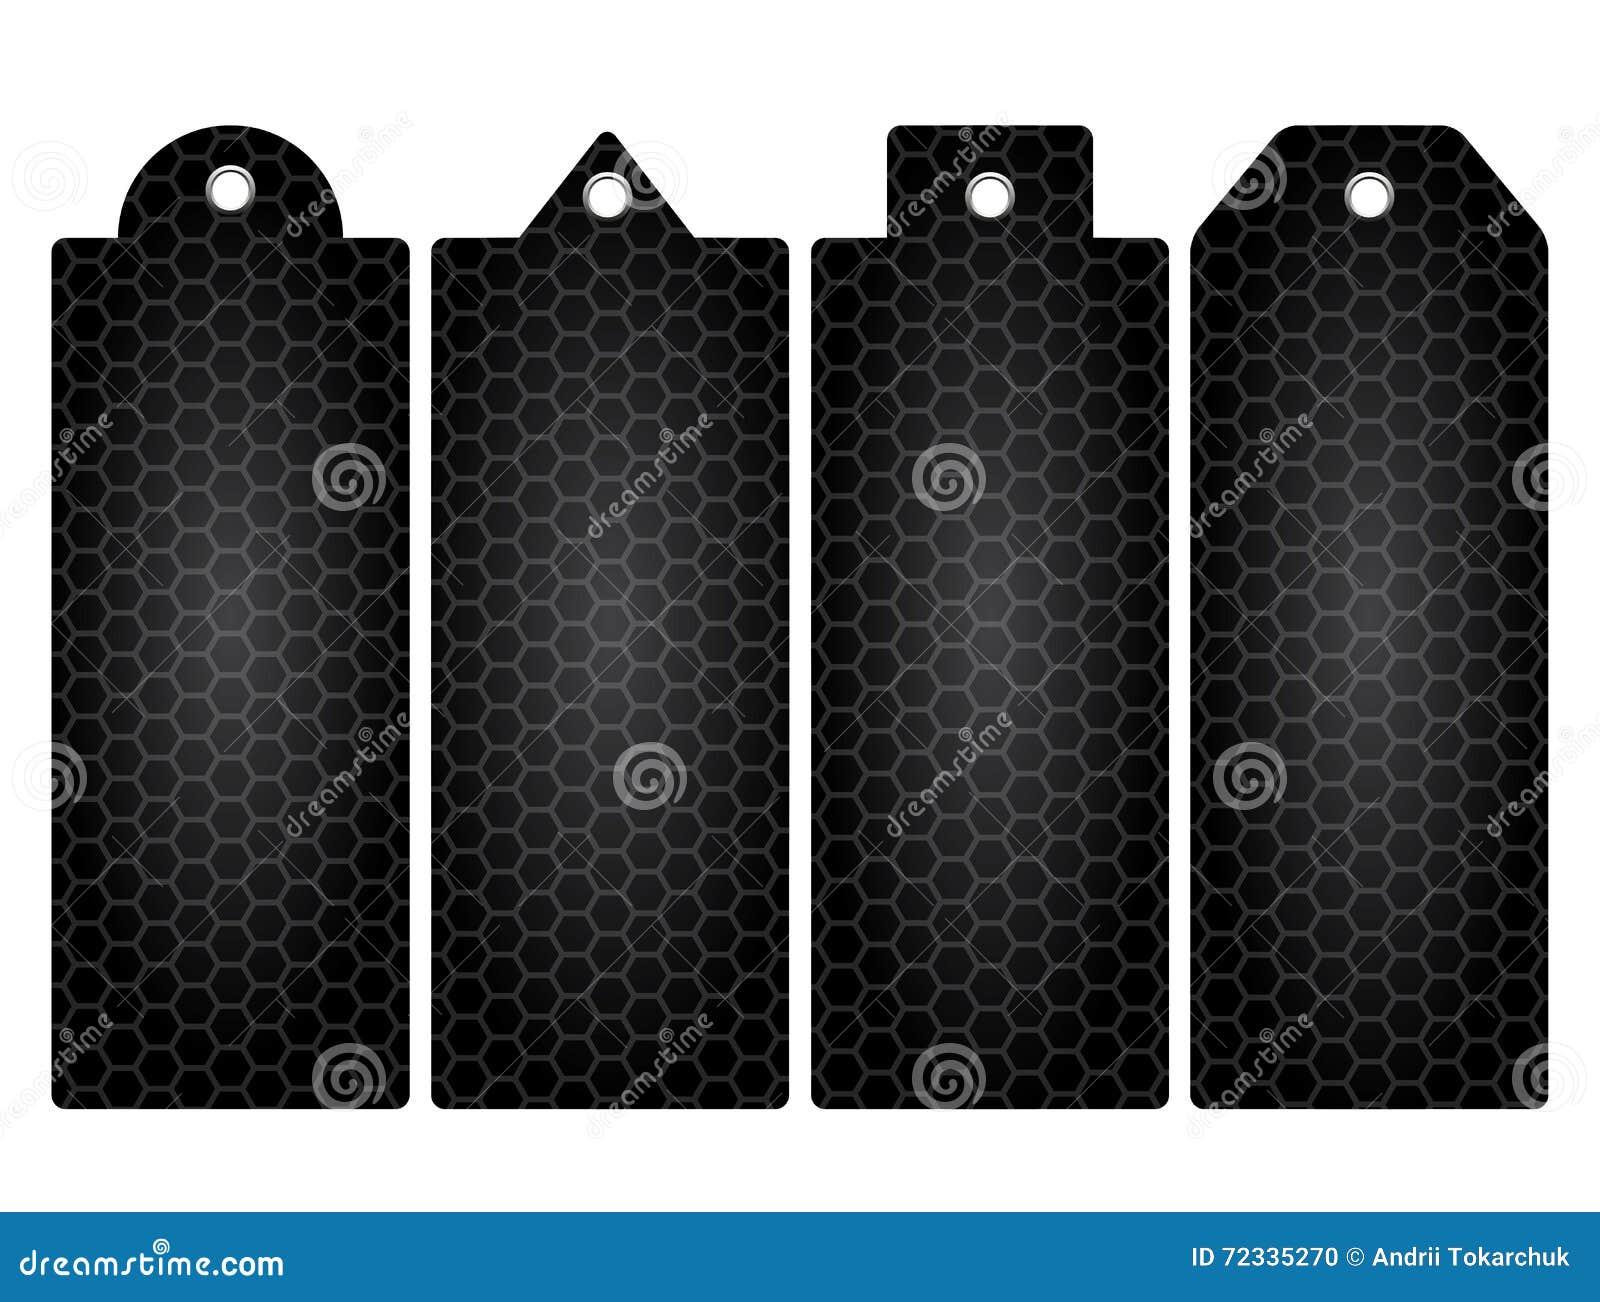 Price Tag, Label  Honeycomb  Iron Mesh  Stock Vector